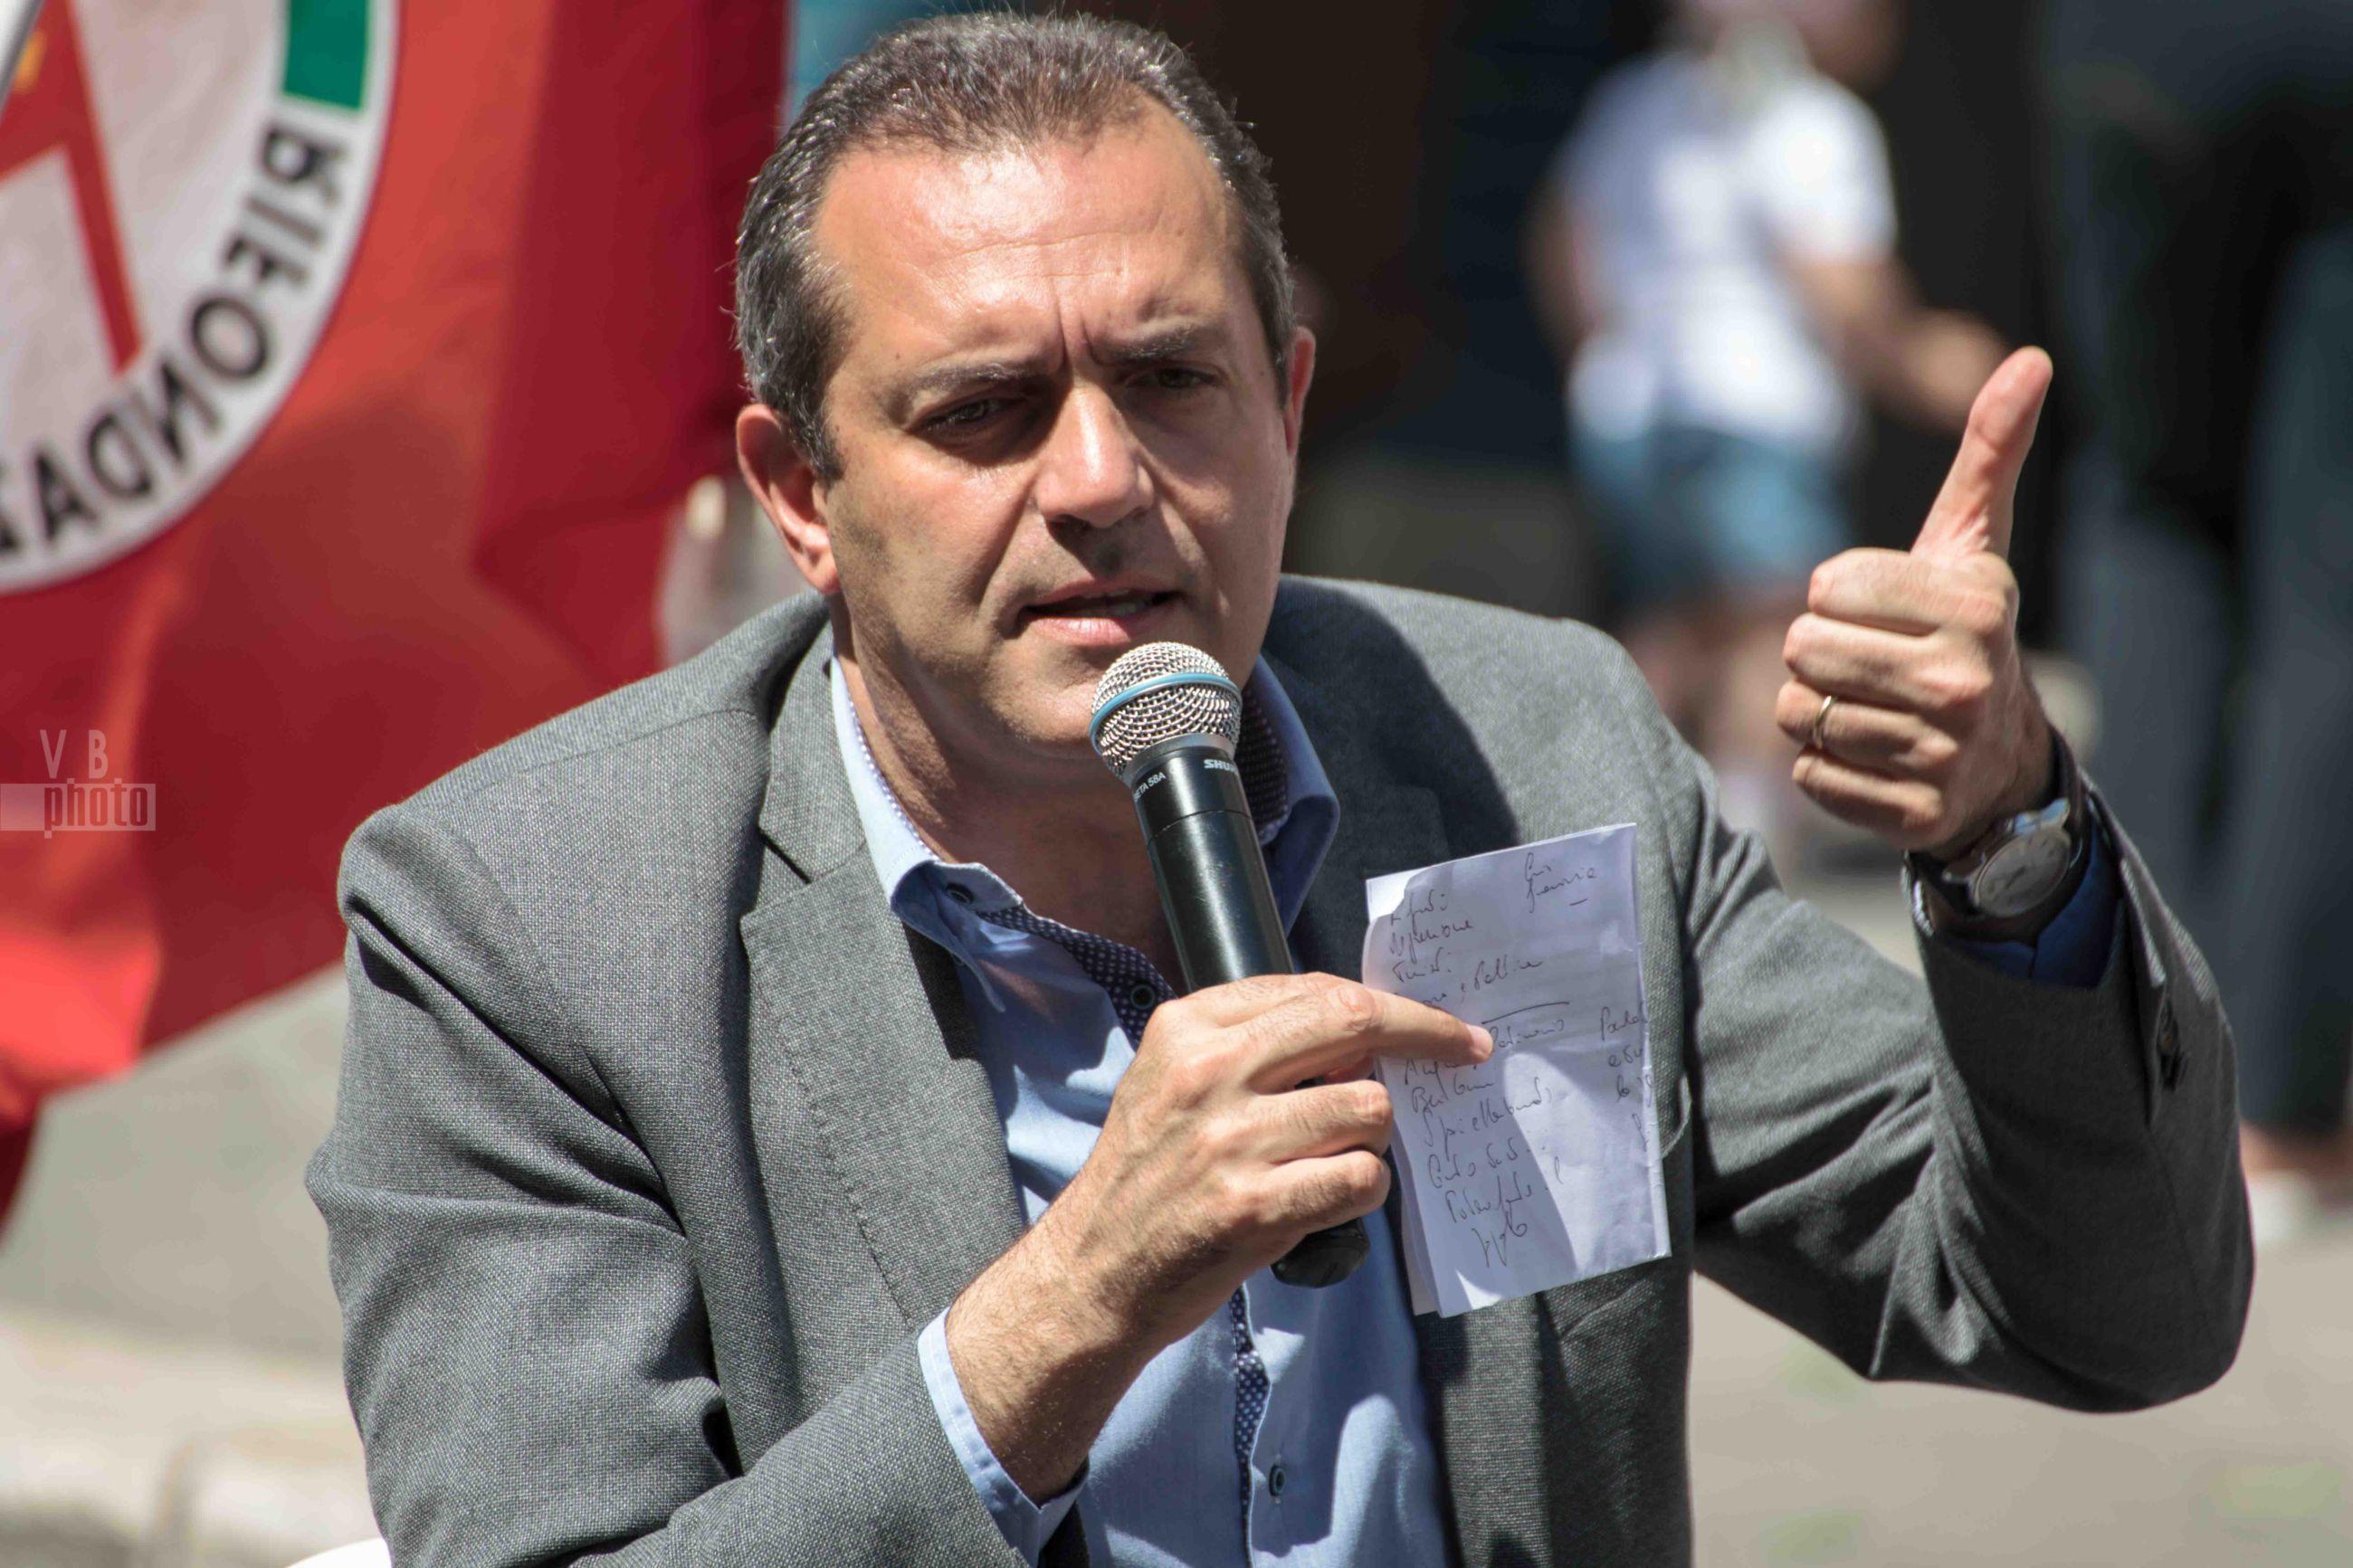 Luigi de Magistris e Gianni Porta - 8 giugno 2017 - Molfetta